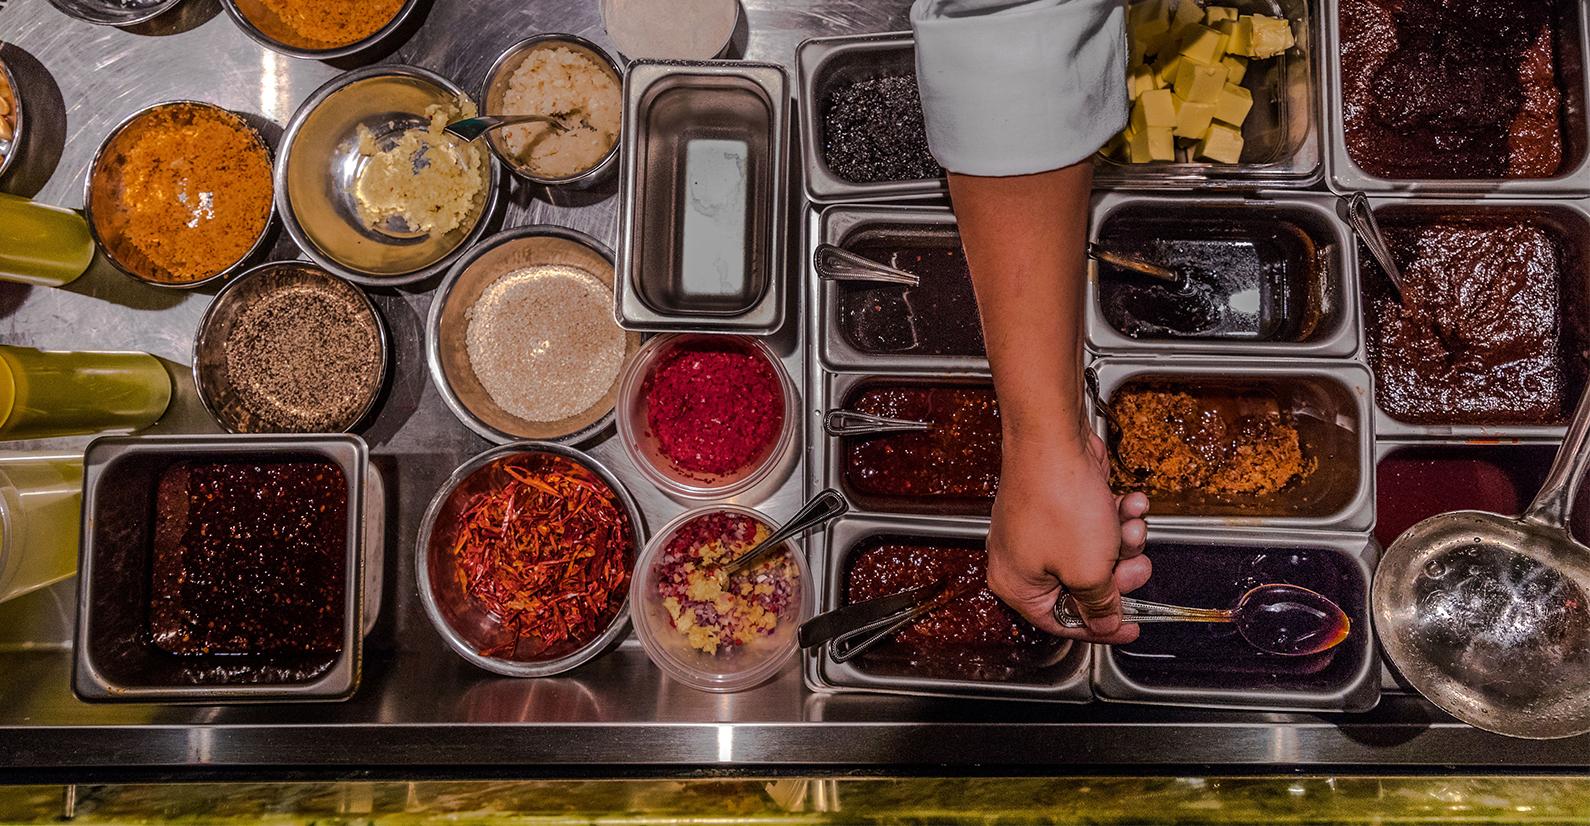 Pablo's Snack House - Honeycomb Hospitality